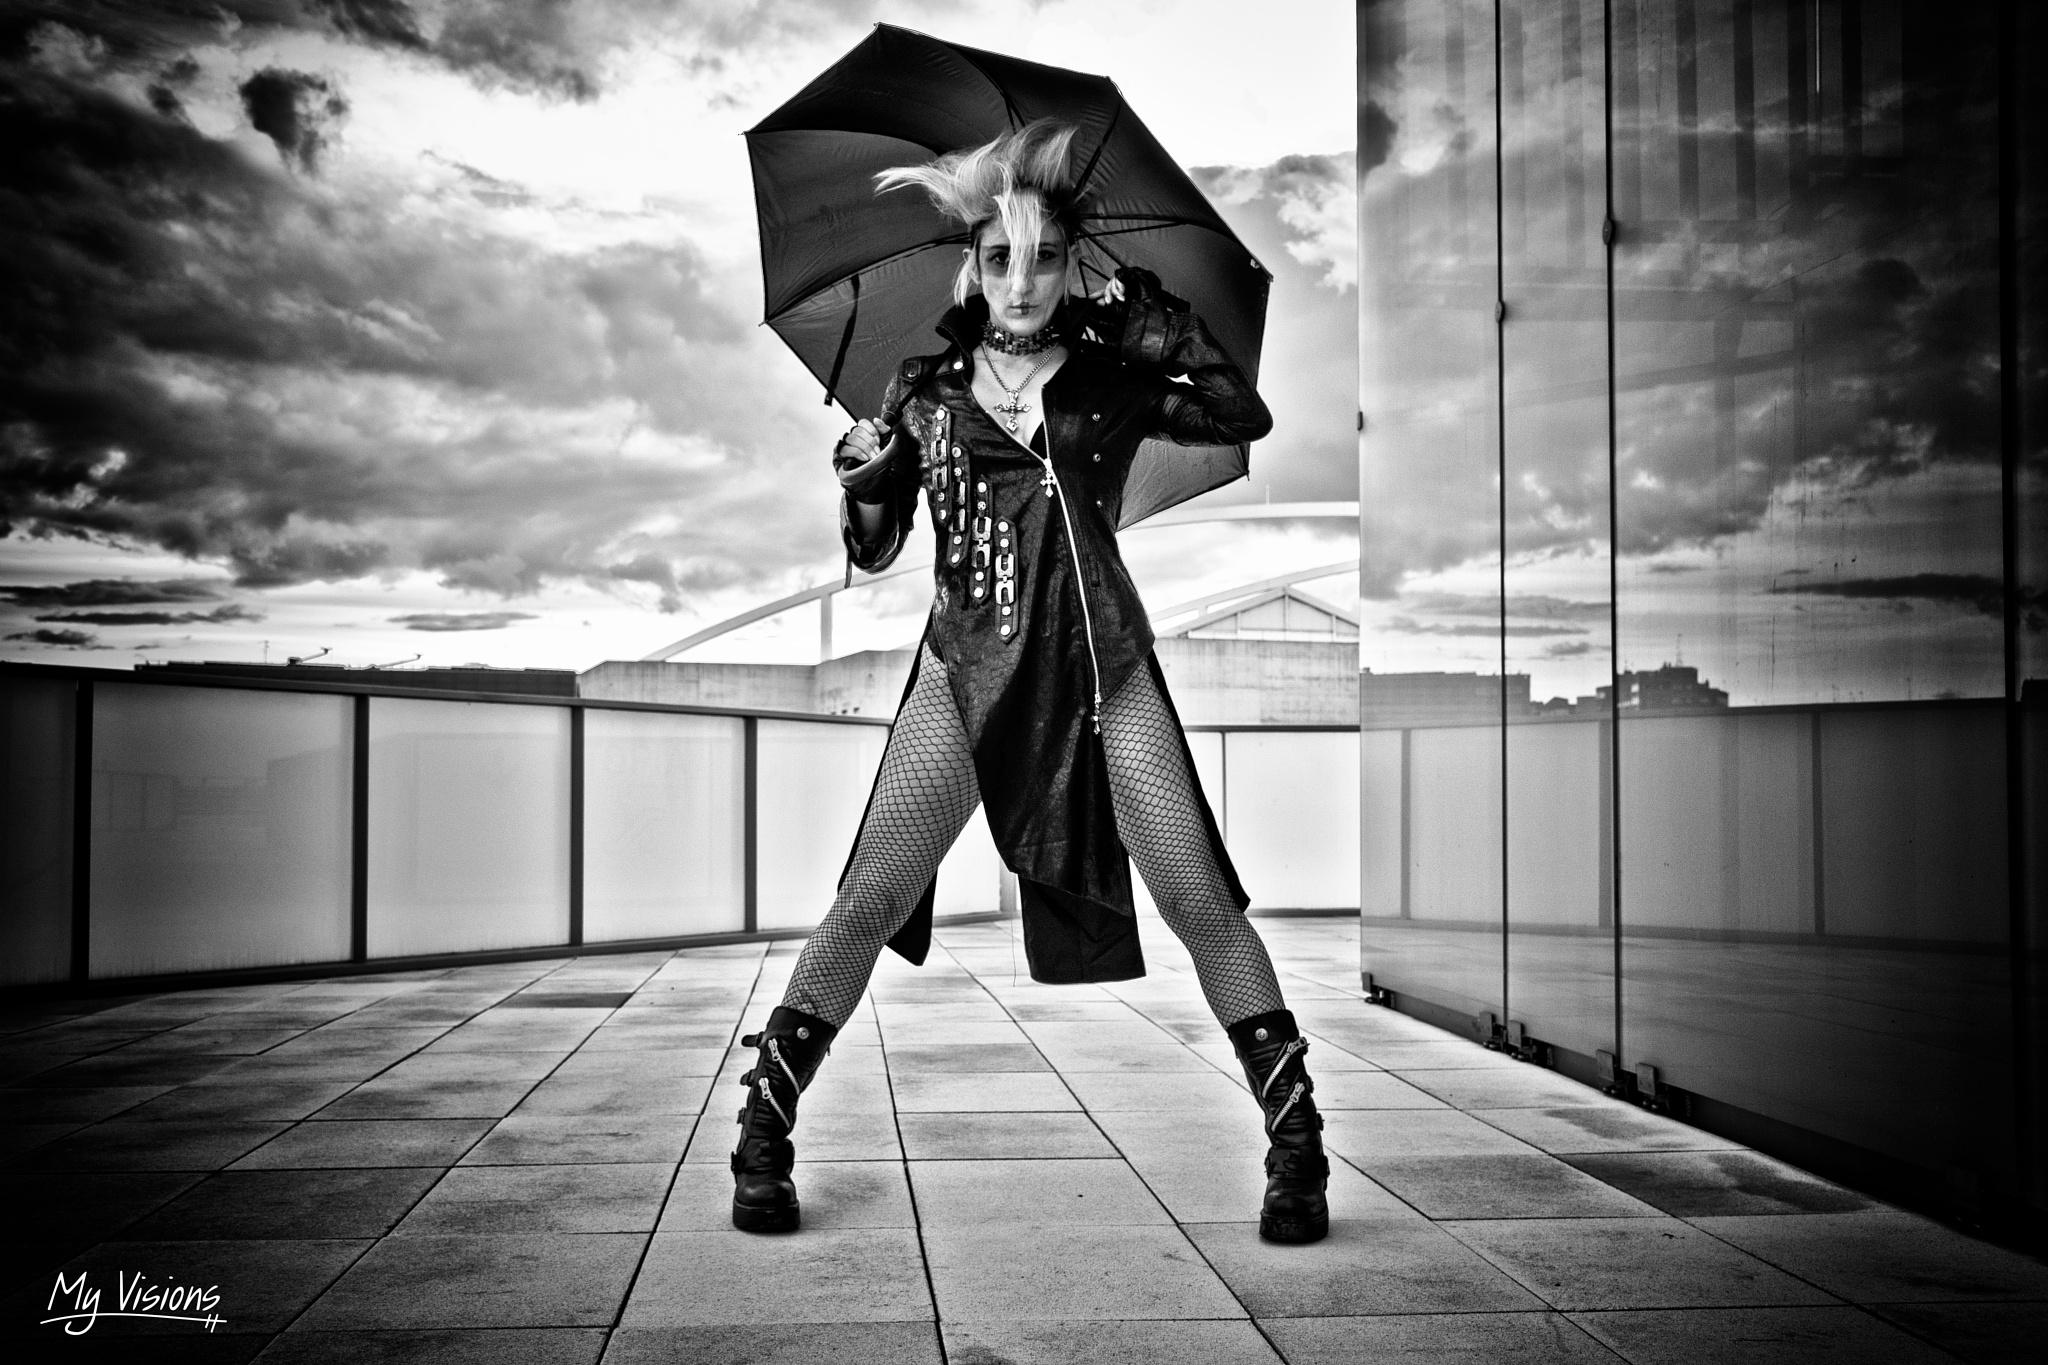 Esperando la lluvia by Marife Castejon (MyVisions)